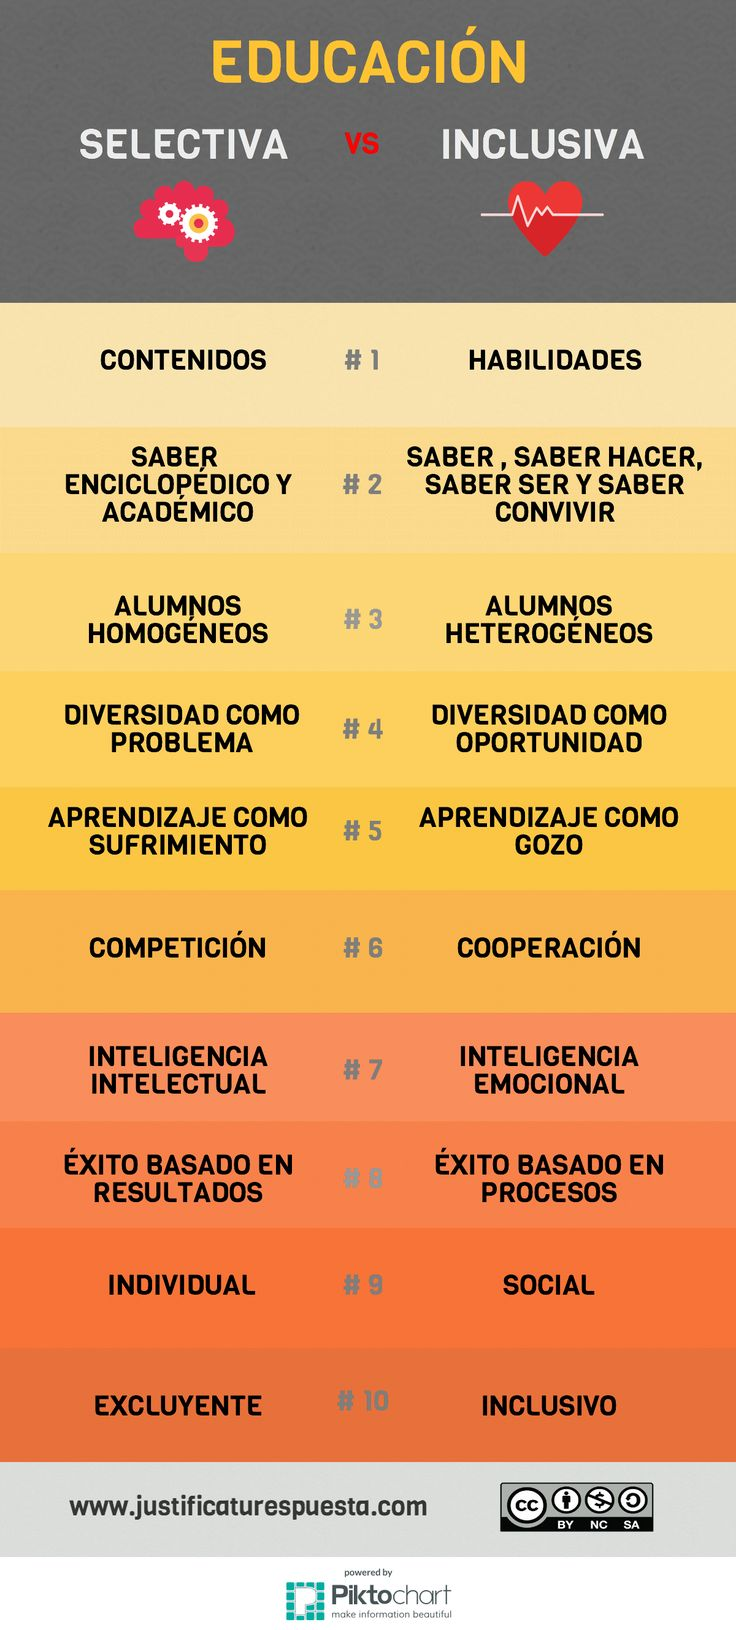 tabla comparativa entre educación selectiva e insclusiva